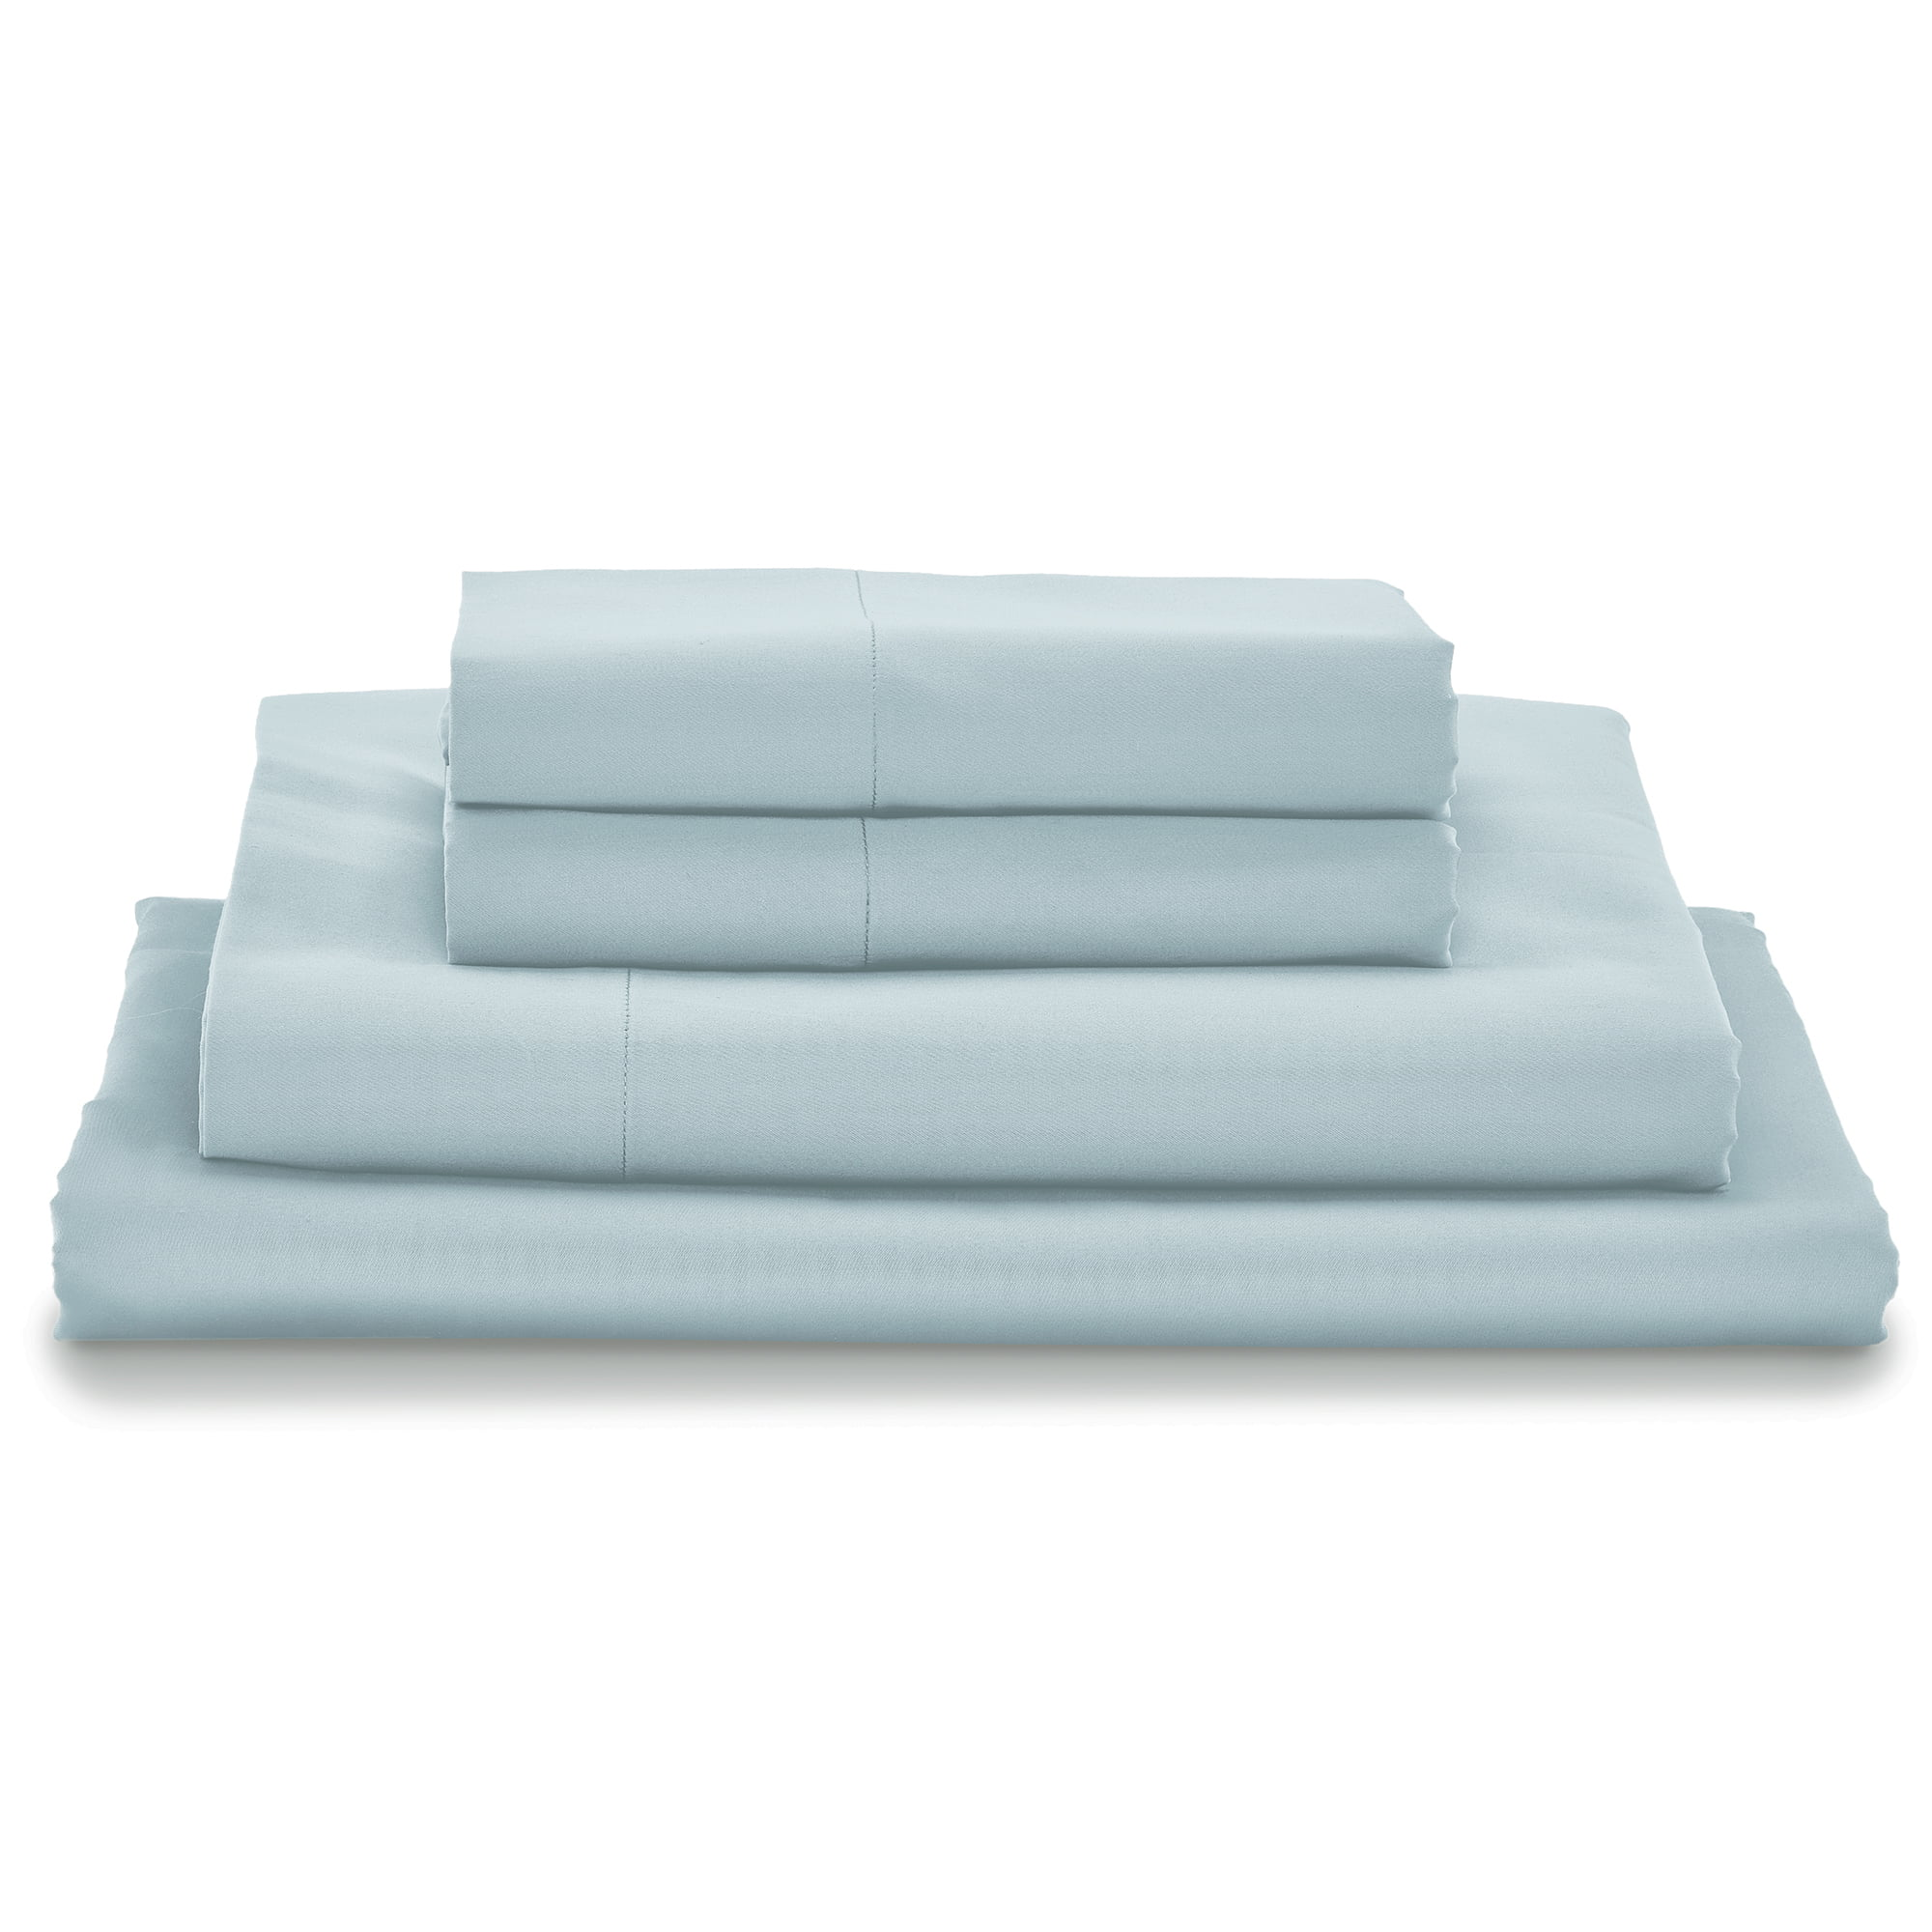 my pillow bed sheets twin xl light blue long staple cotton giza dreams bed sheet set